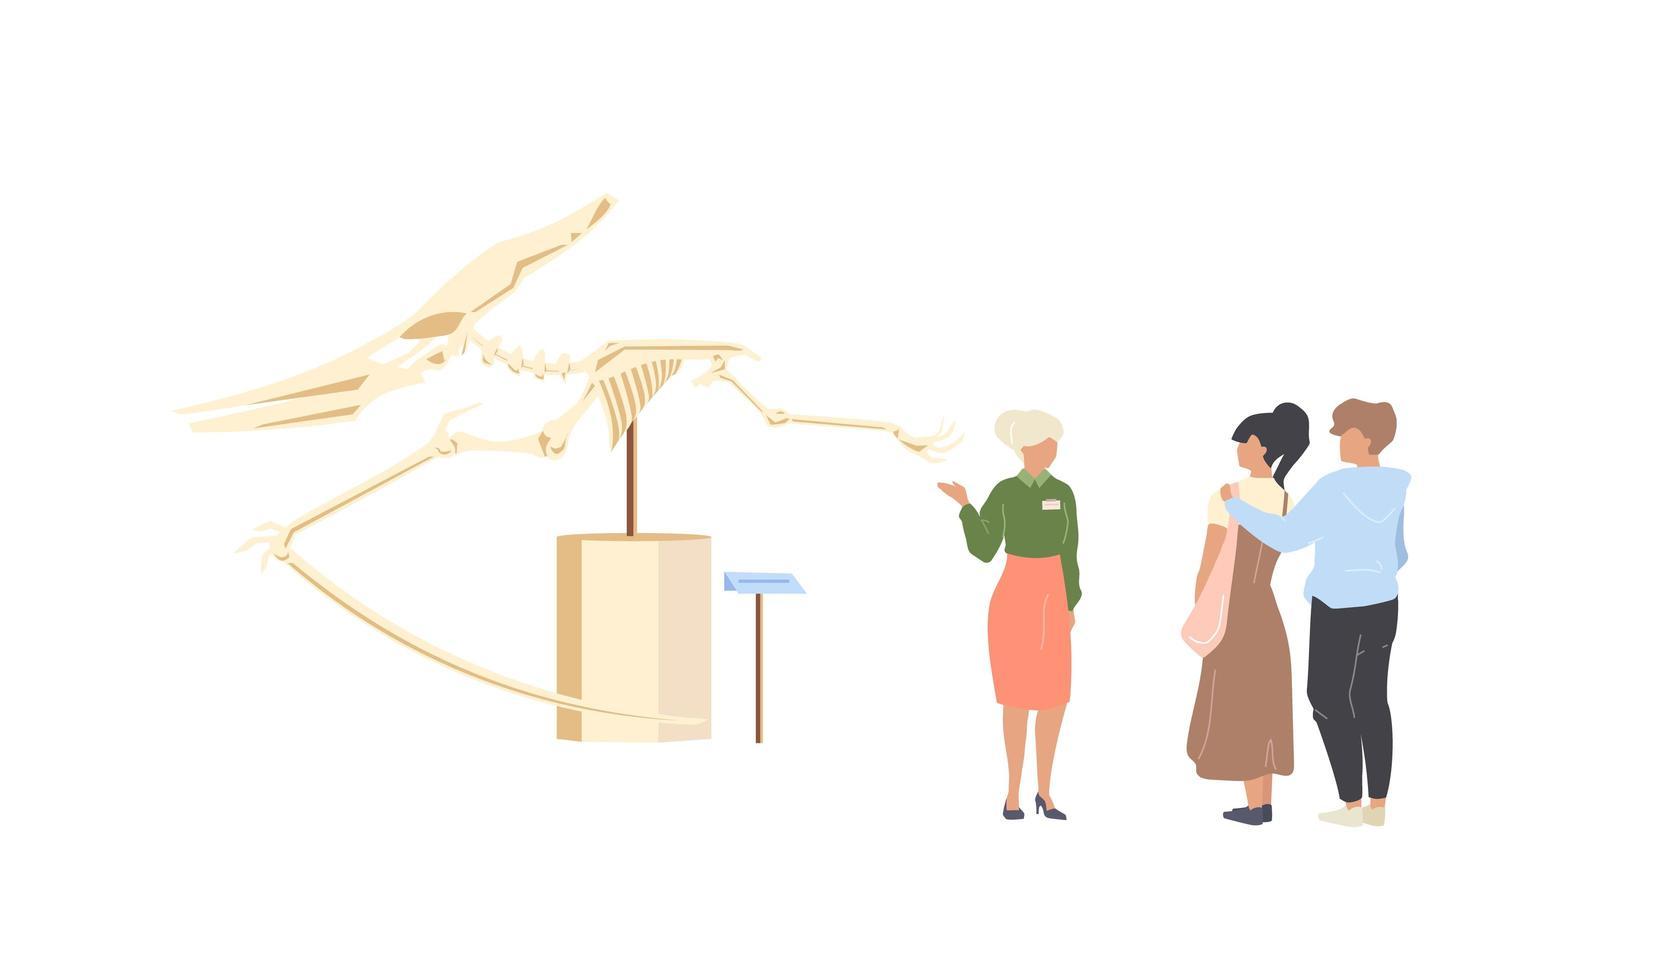 paleontologie museum toerist vector